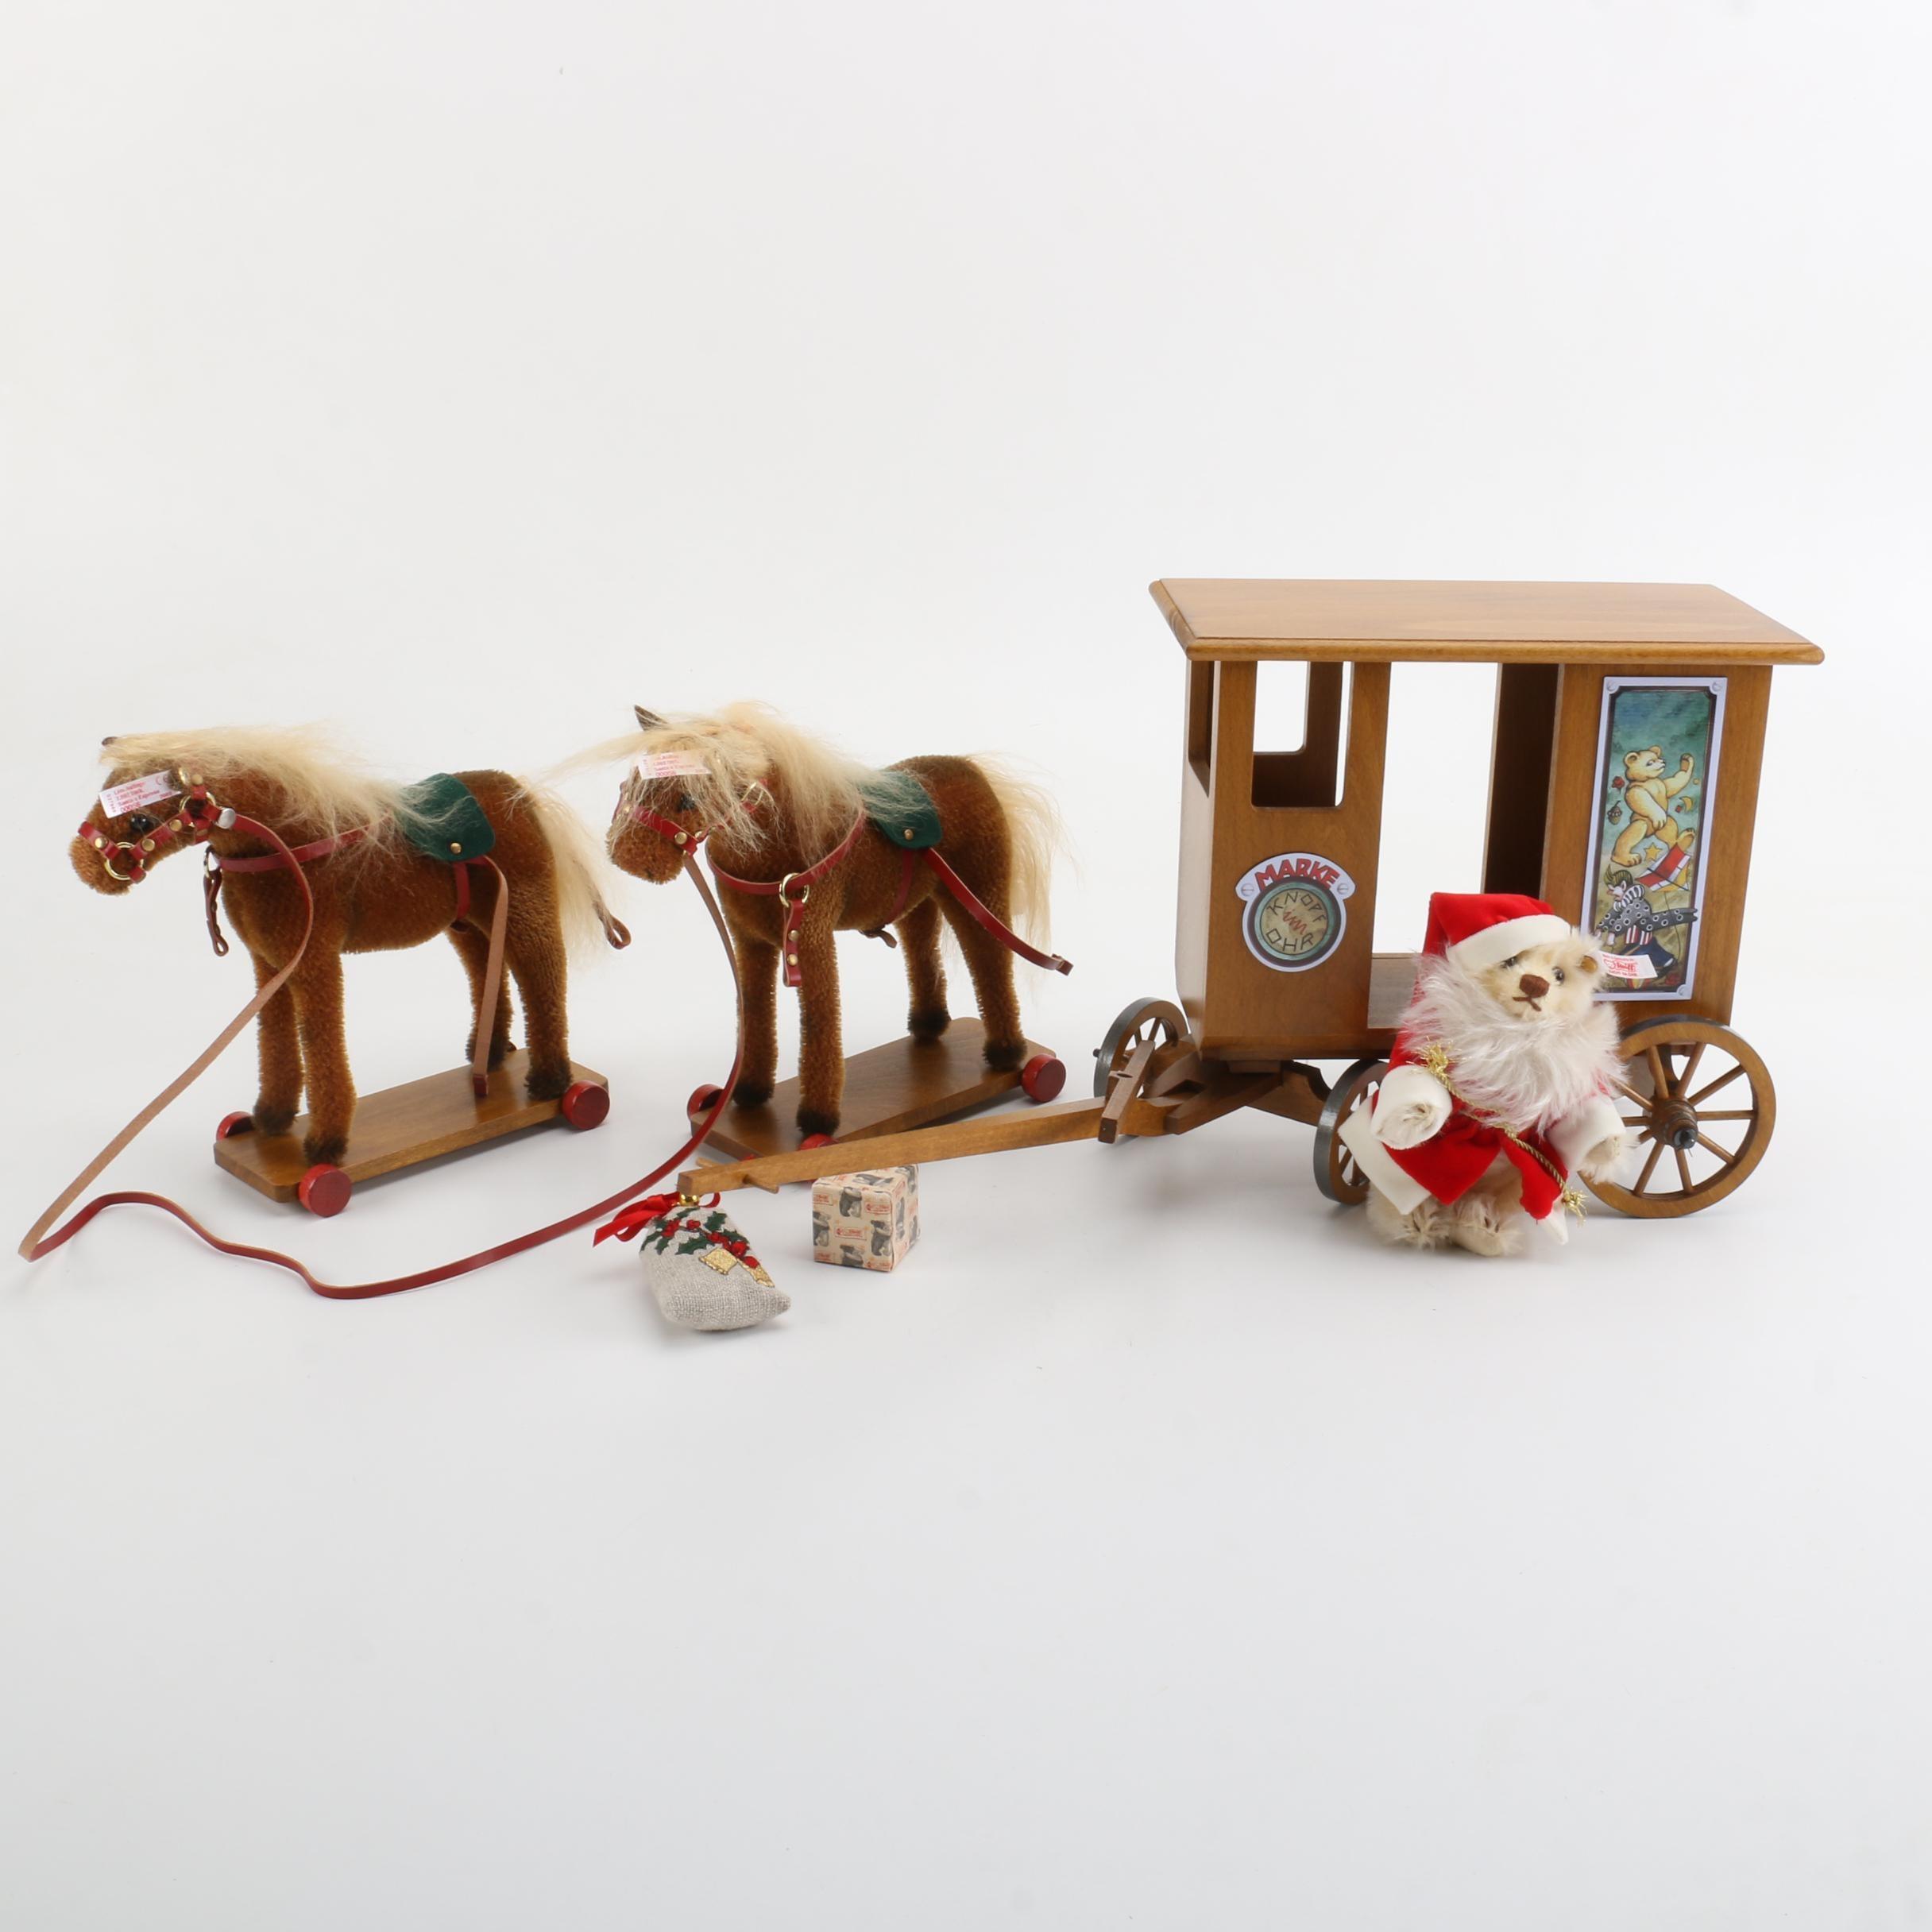 Steiff Santa's Express Set